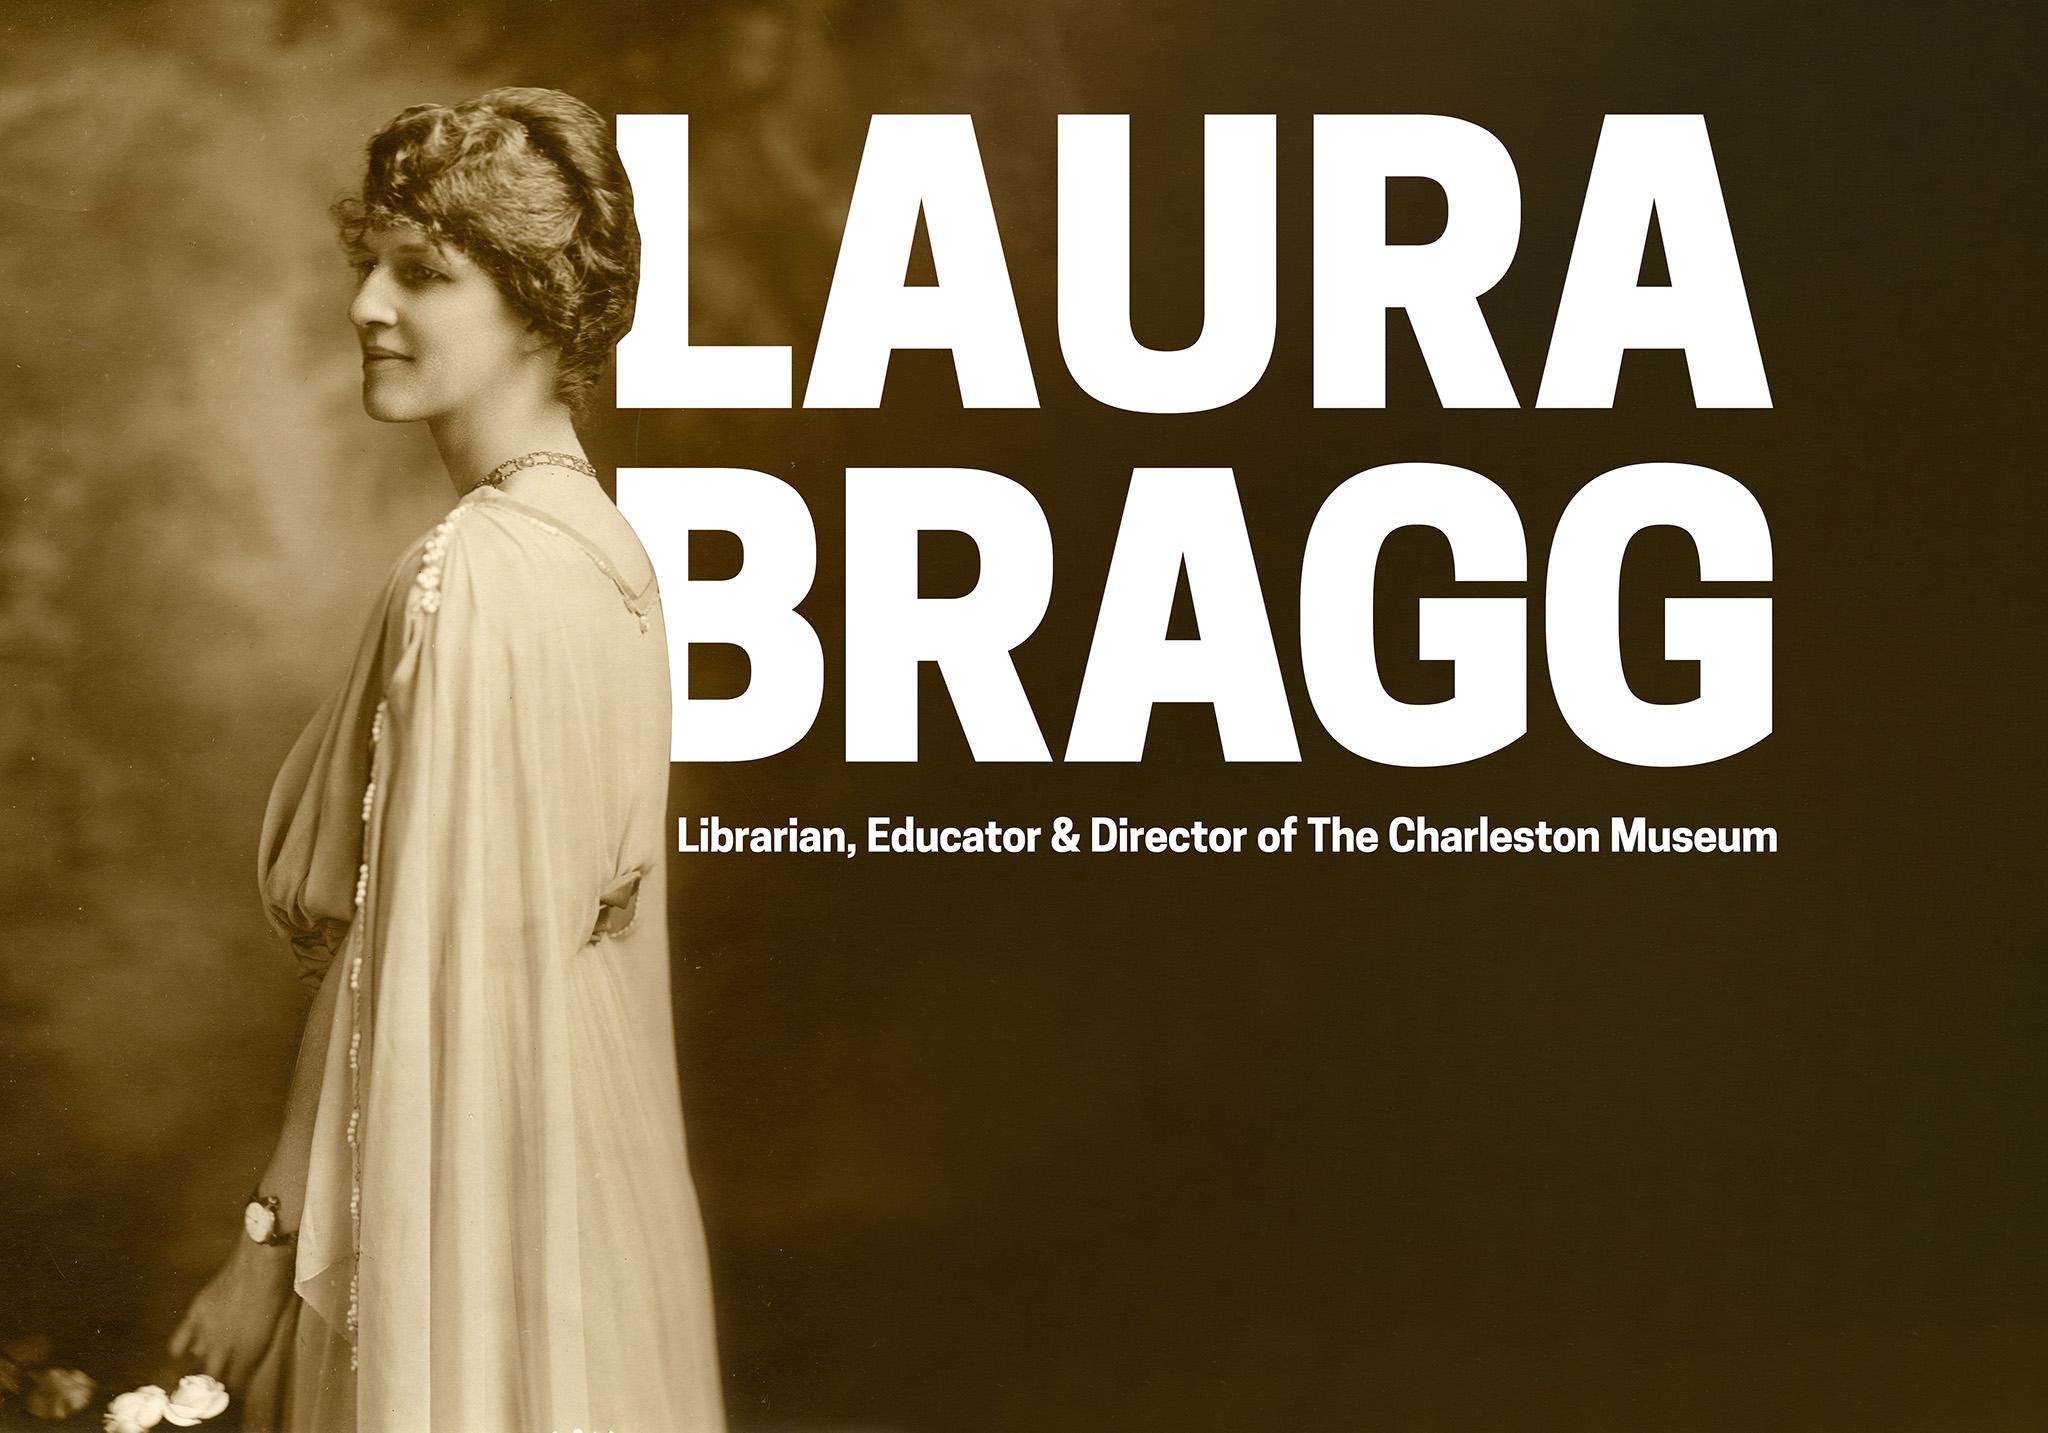 Laura-Bragg-Title-Image